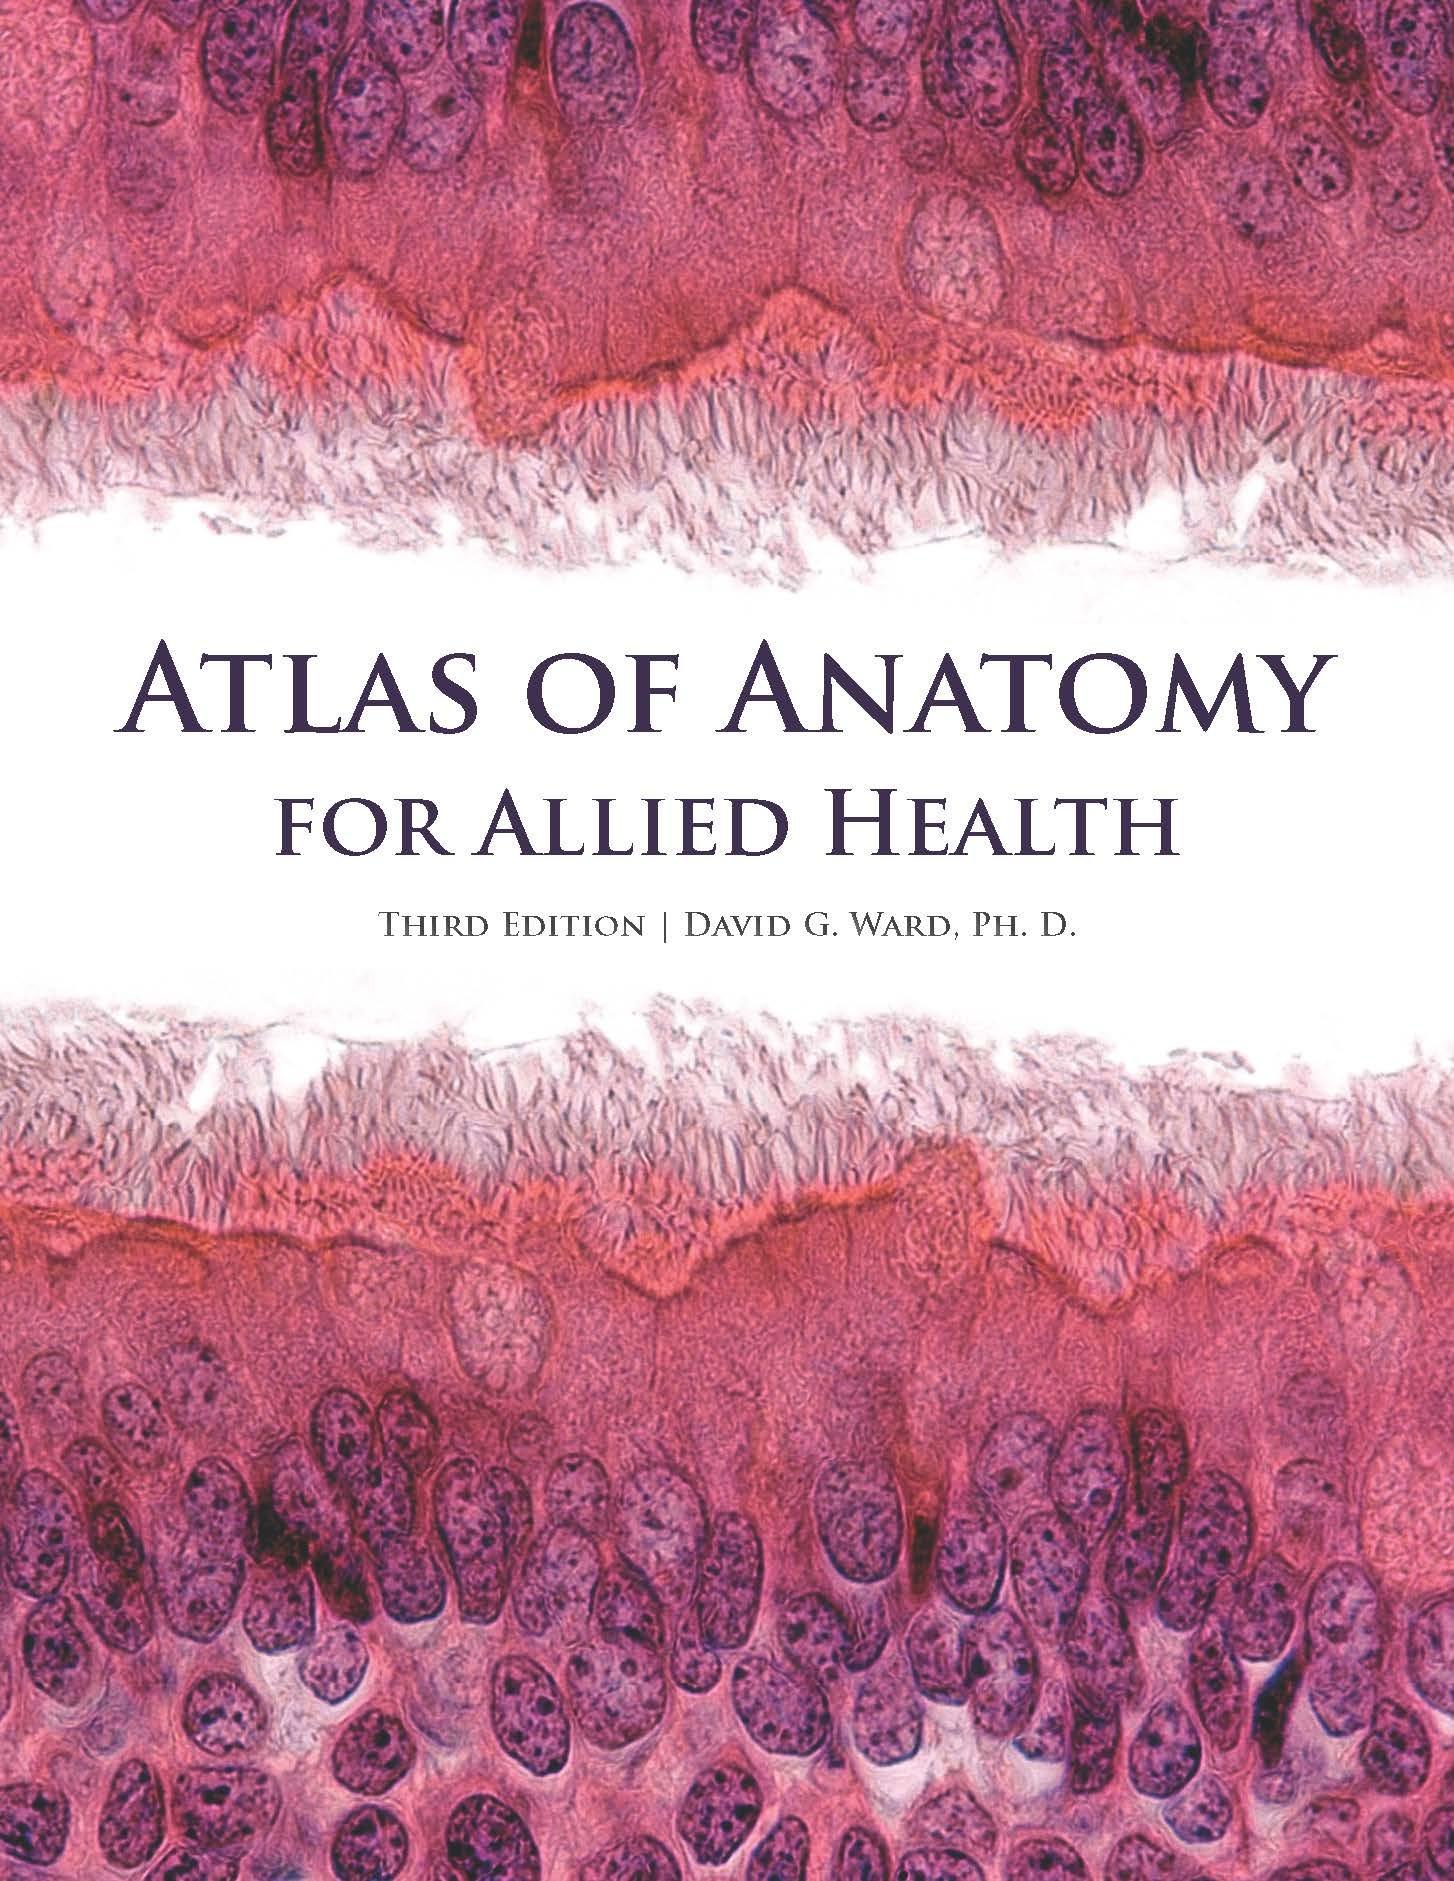 Atlas of Anatomy for Allied Health: David G. Ward: 9781599847184 ...